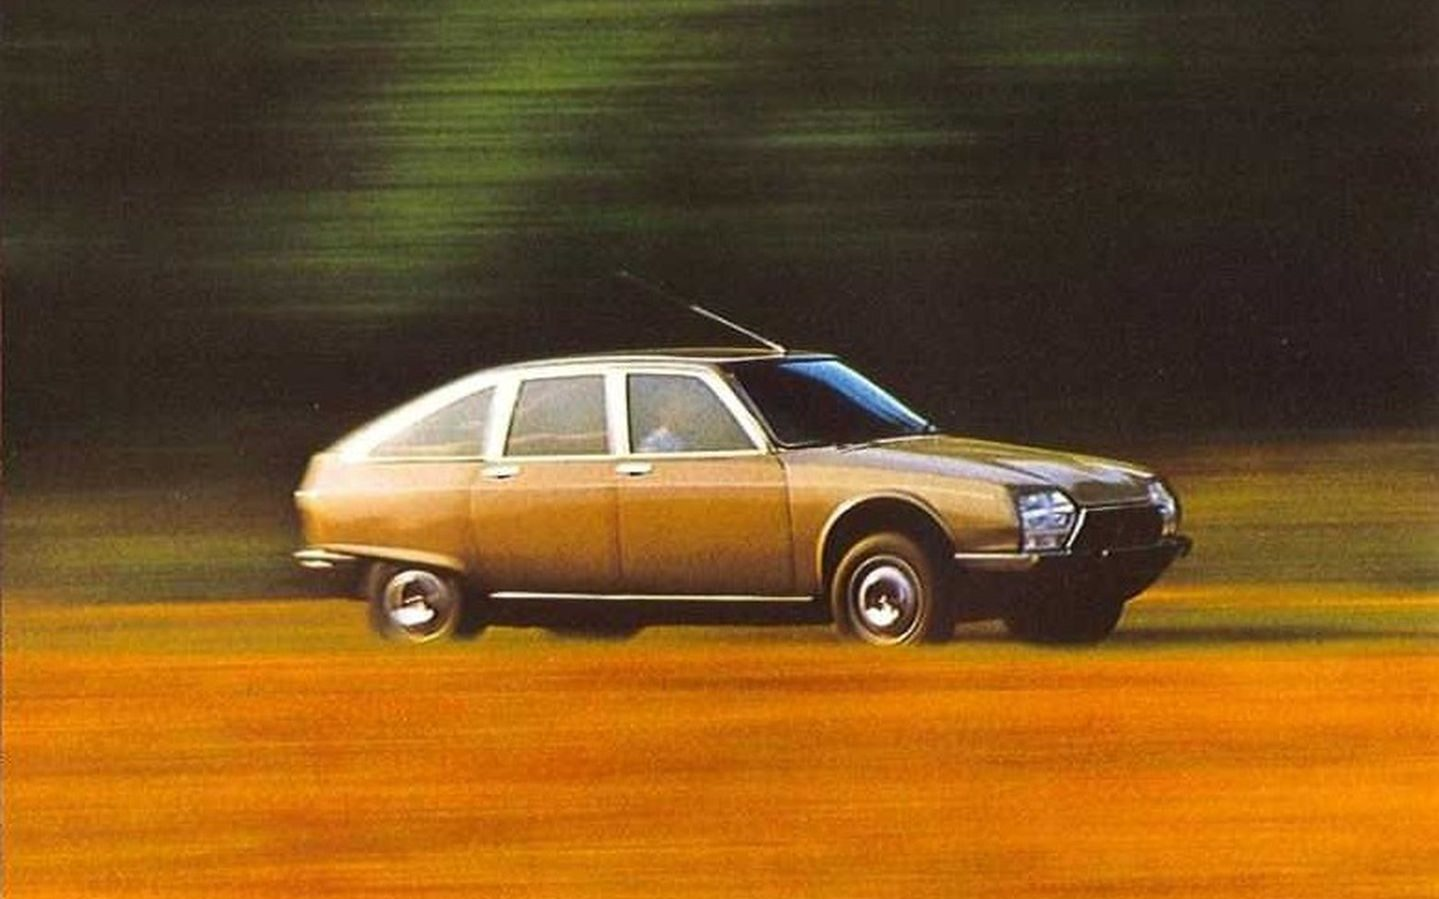 1973 Citroën GS Birotor